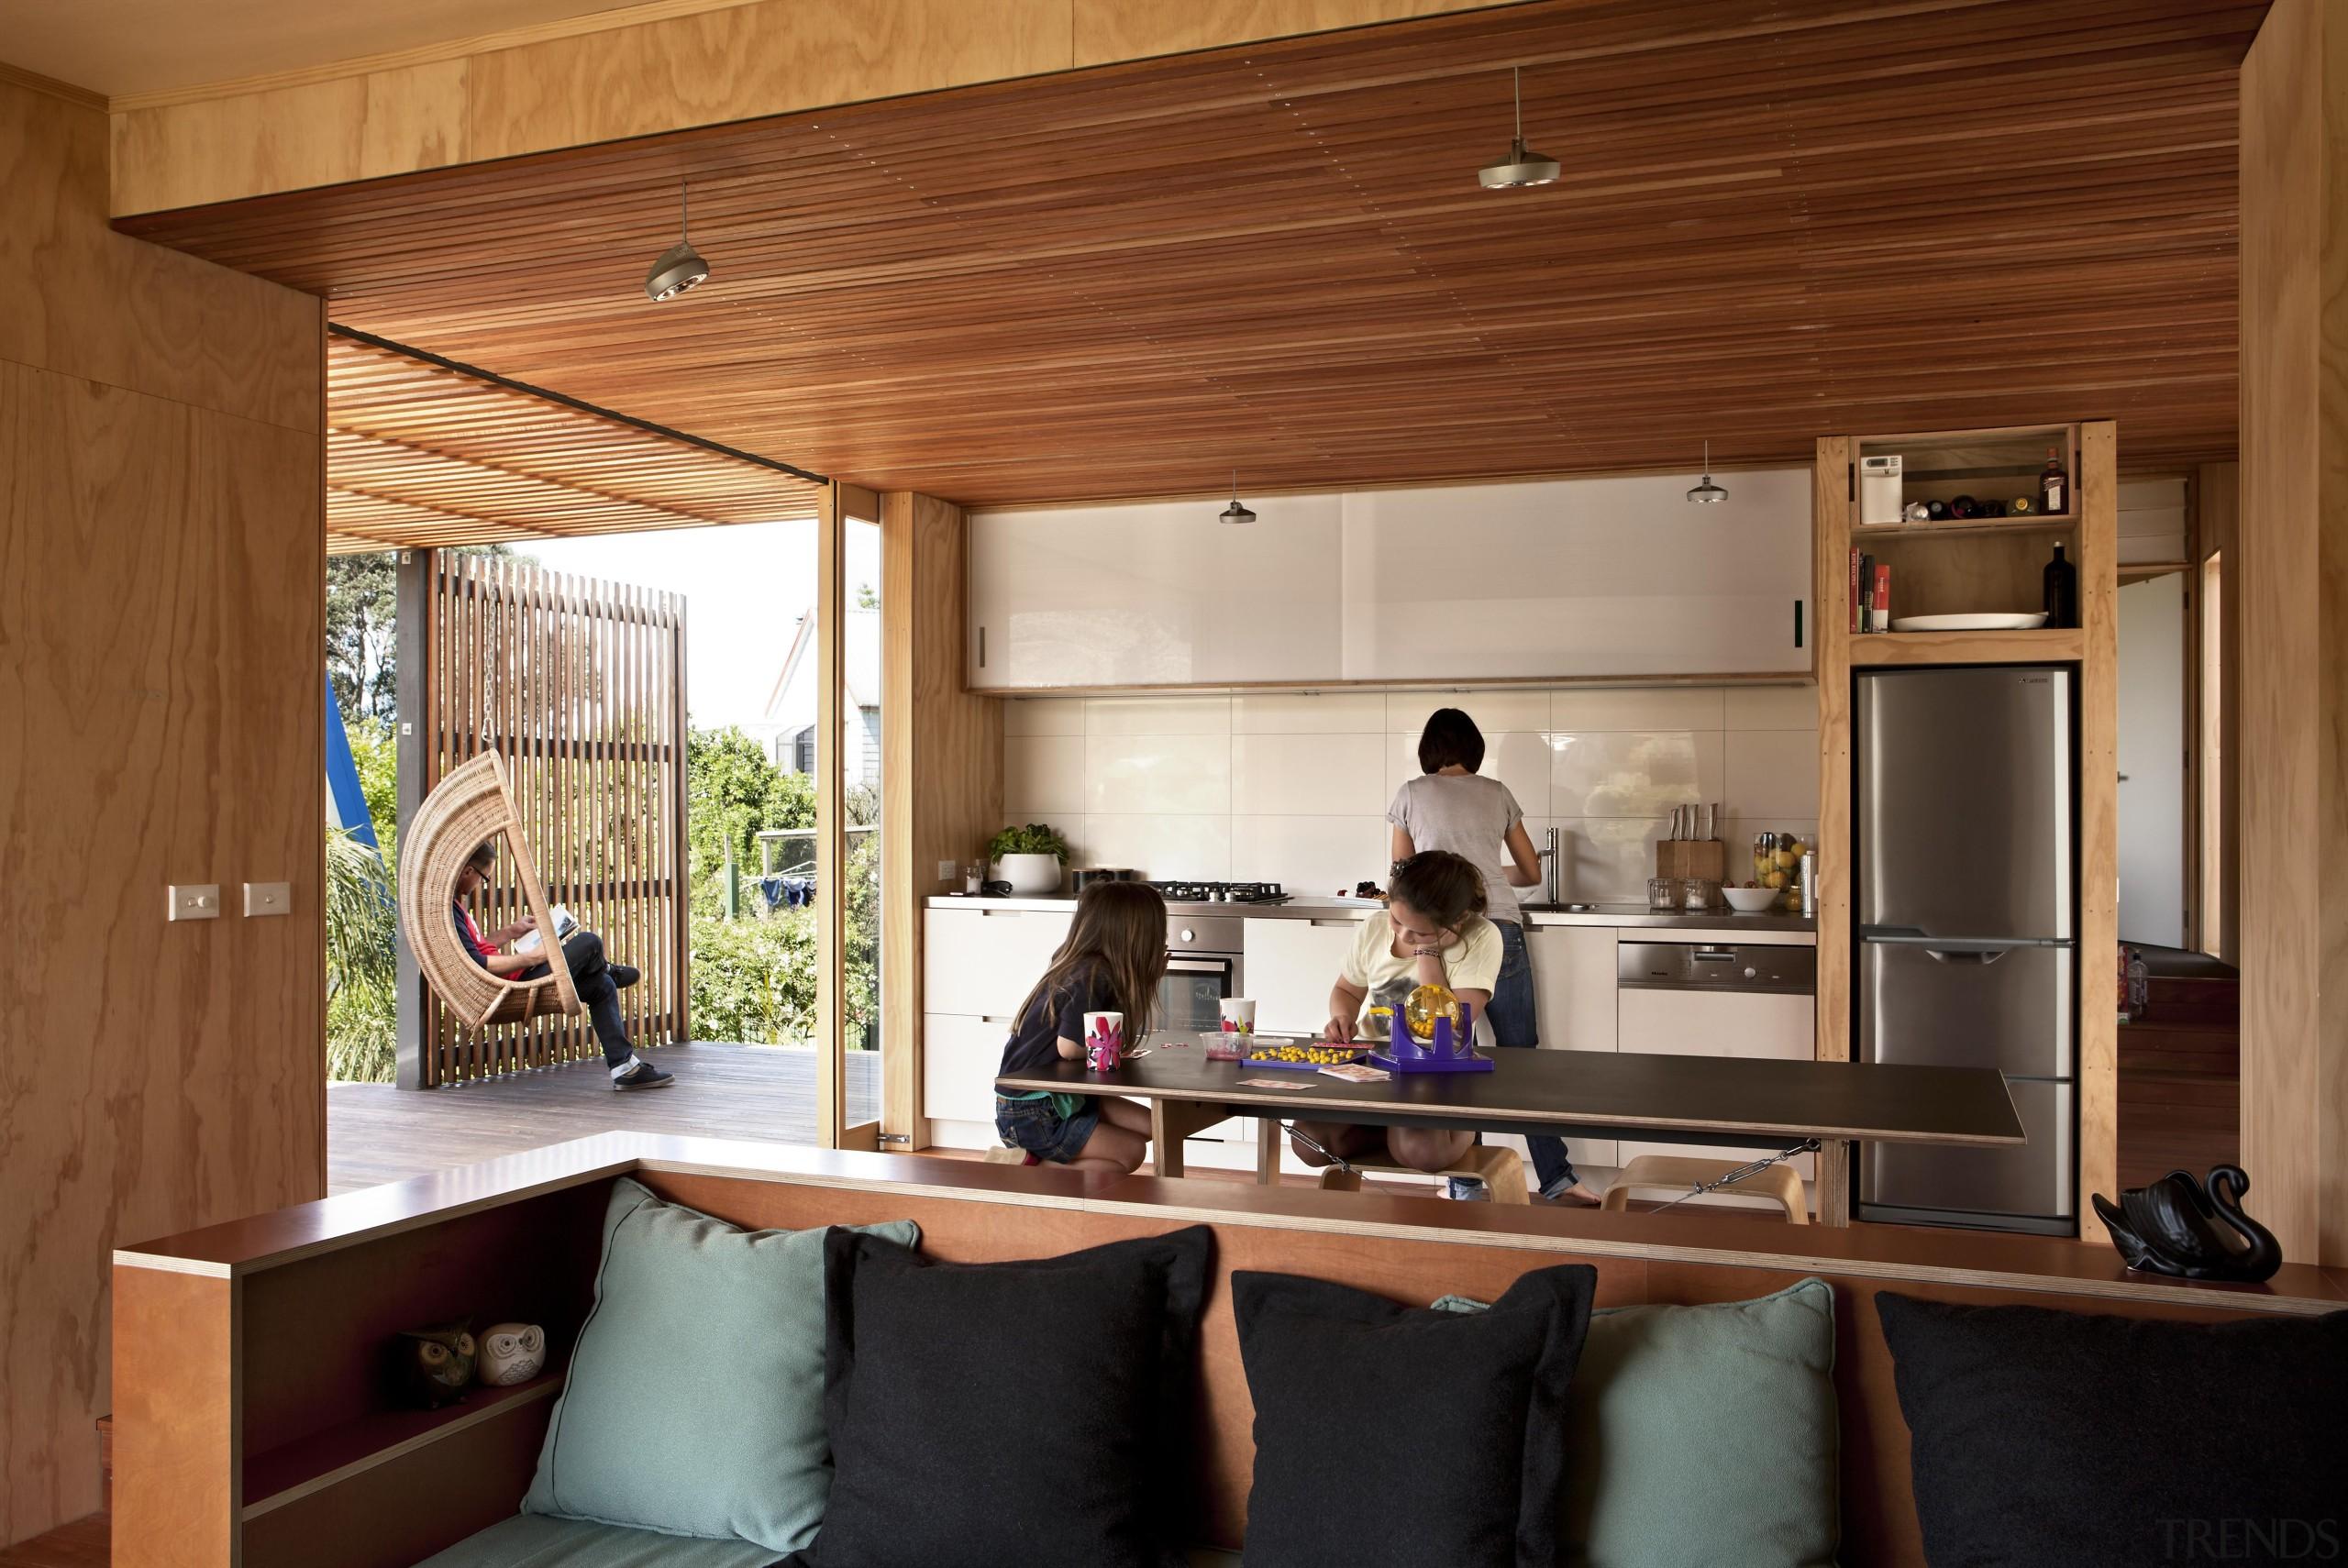 Coromandel, New Zealand - Studio 19 Onemana Bach architecture, ceiling, furniture, home, house, interior design, wood, brown